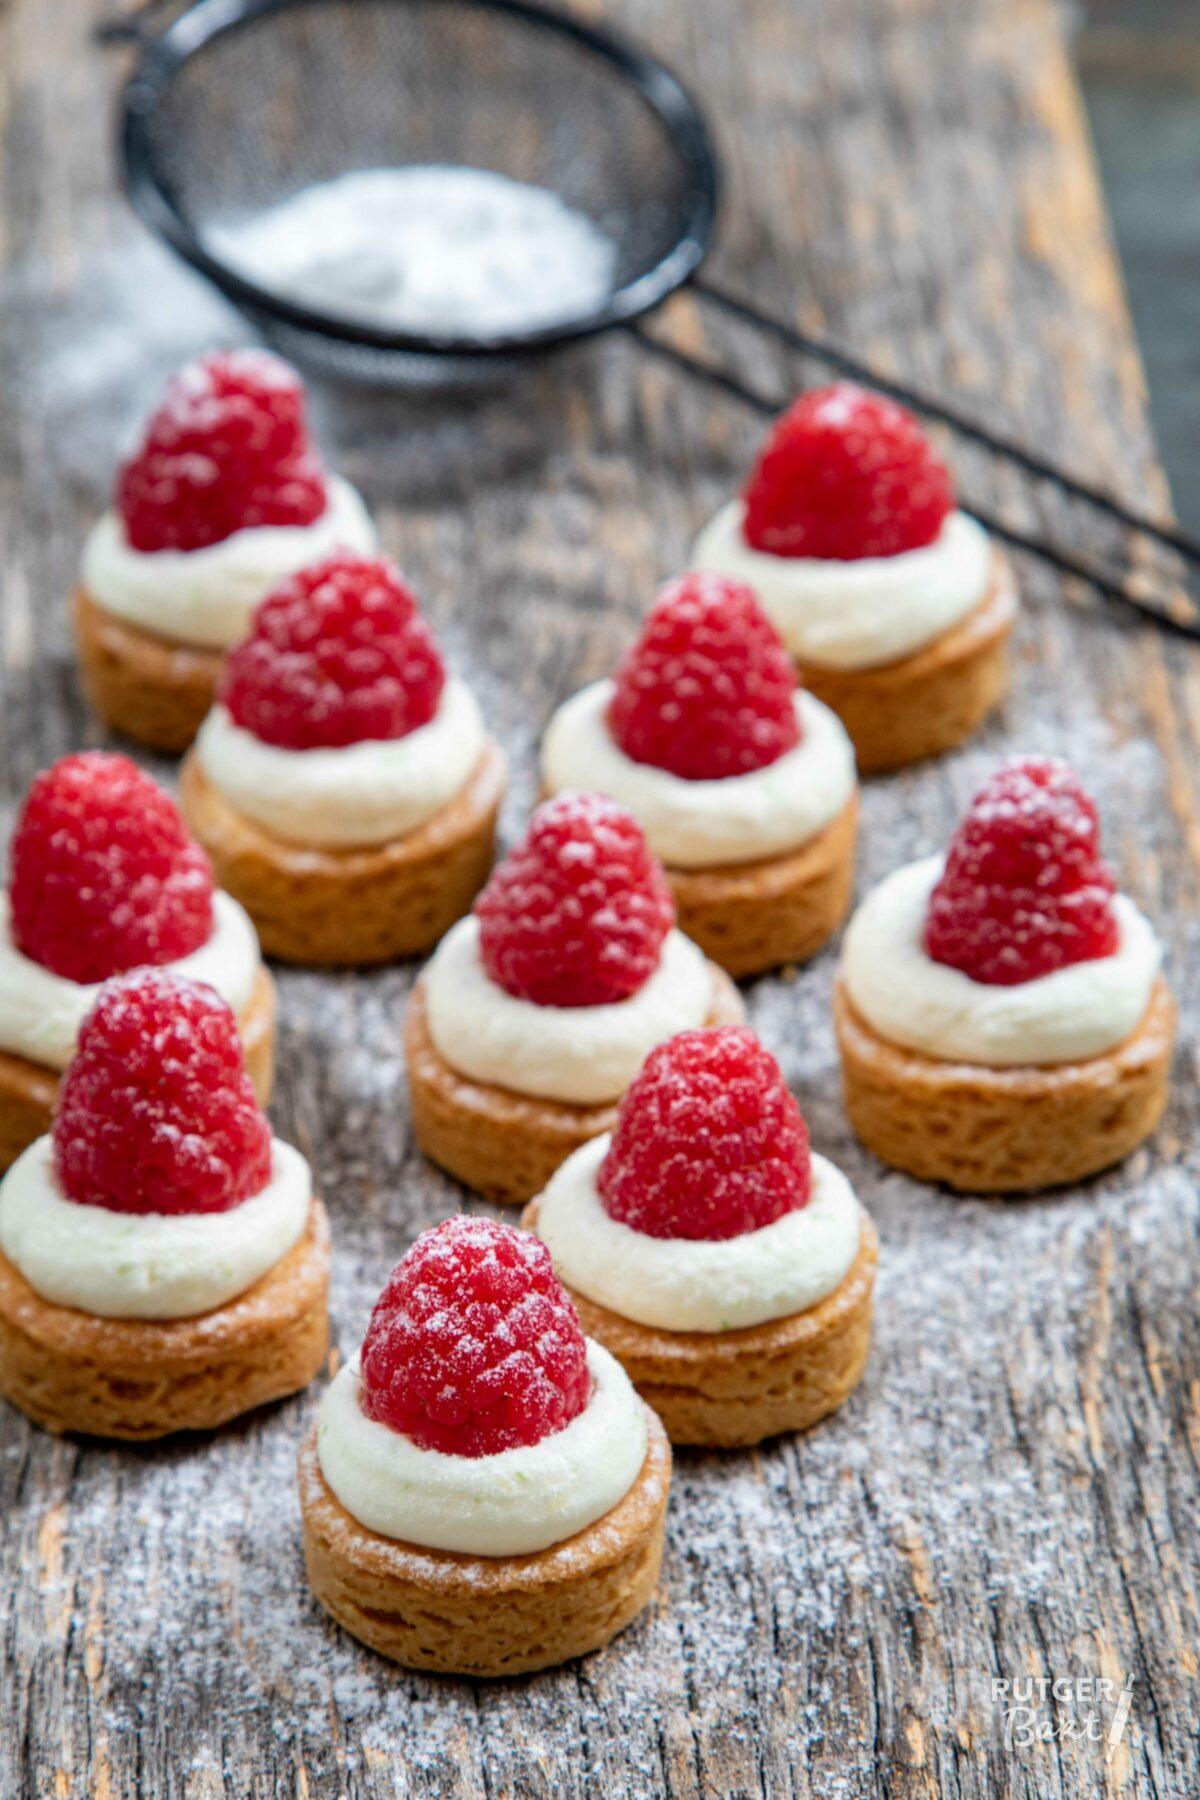 Cheesecake friandises met frambozen – recept